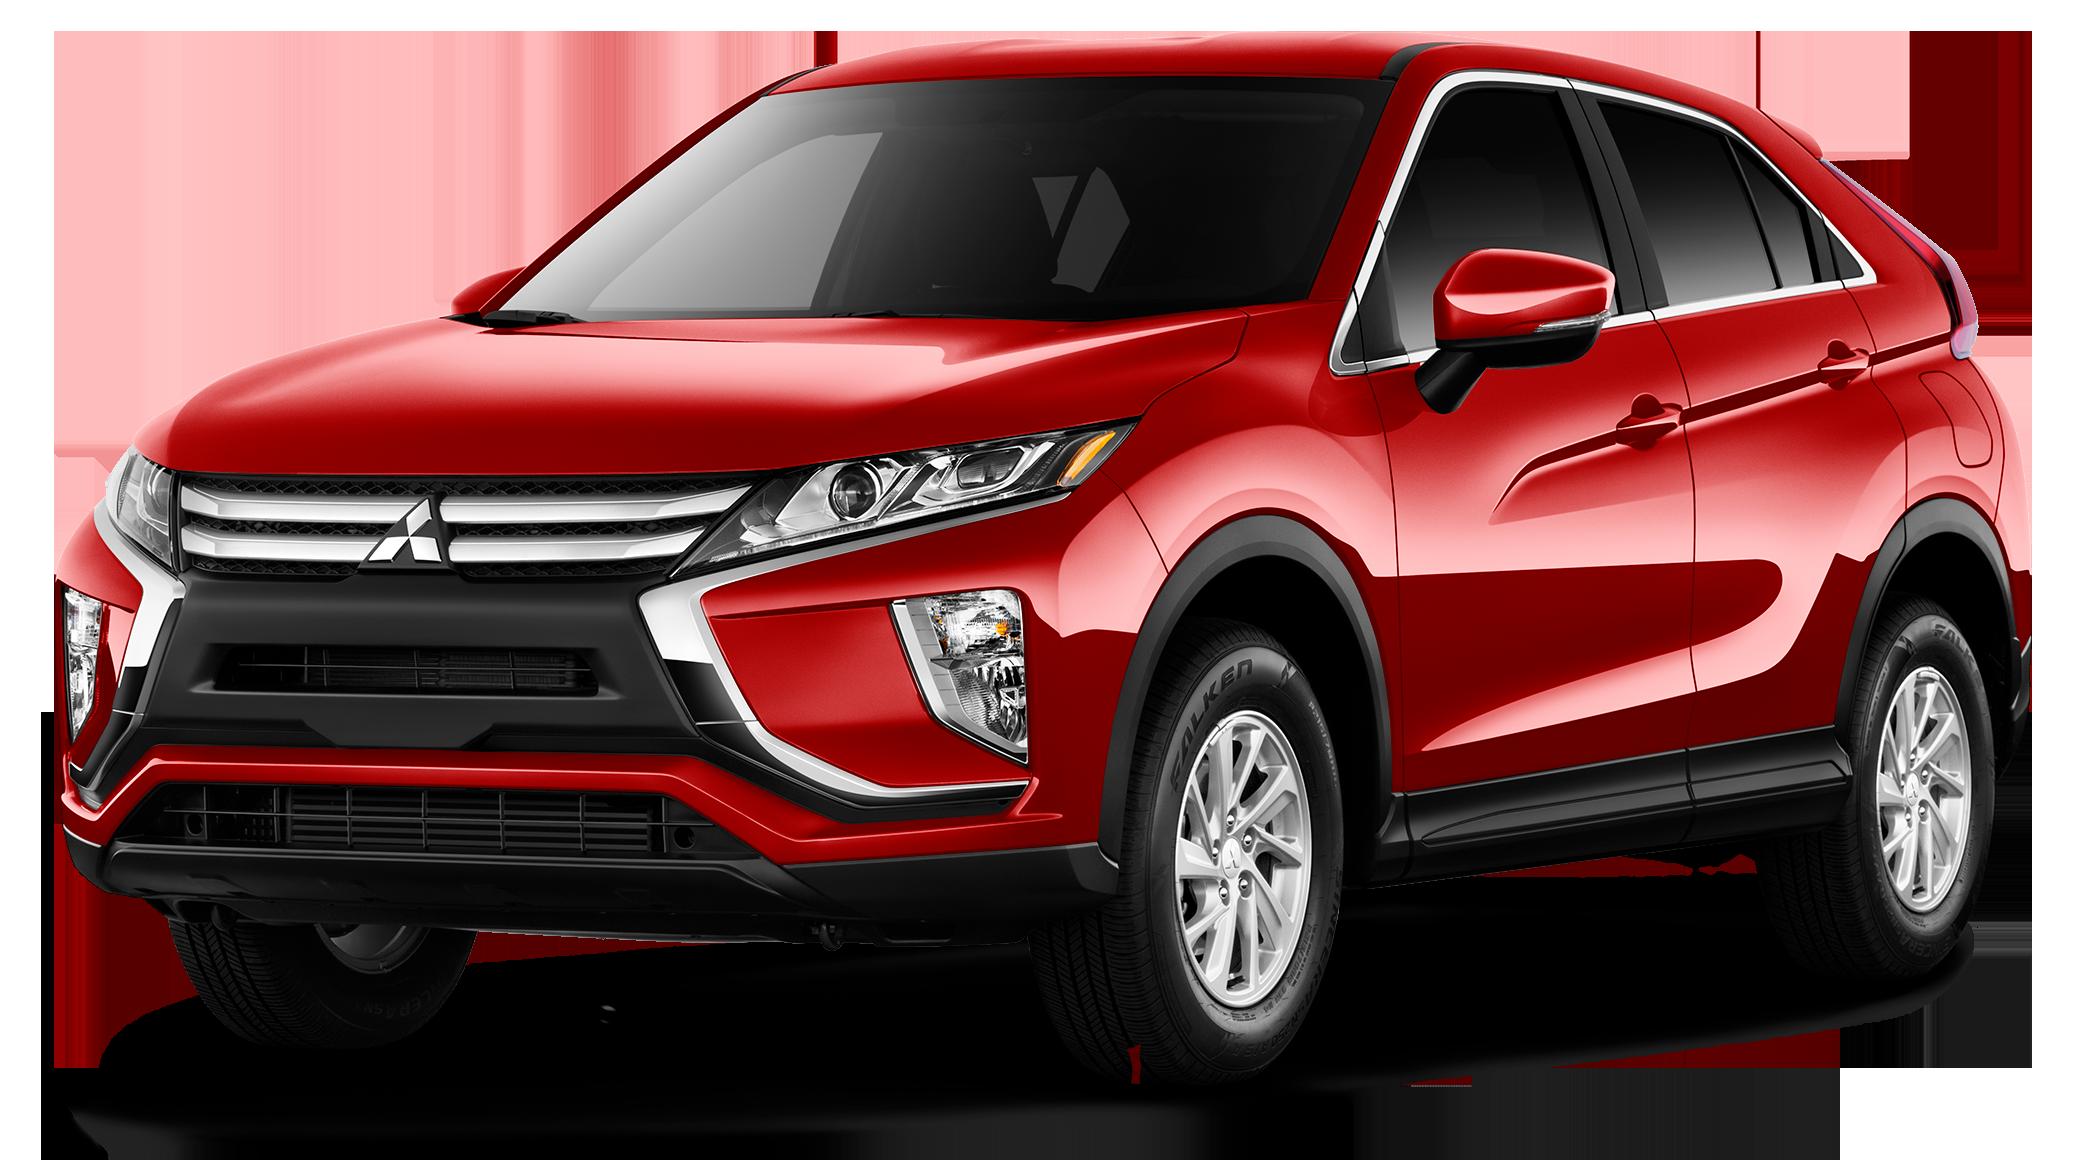 Mitsubishi Incentives, Rebates, Specials in Grand Rapids